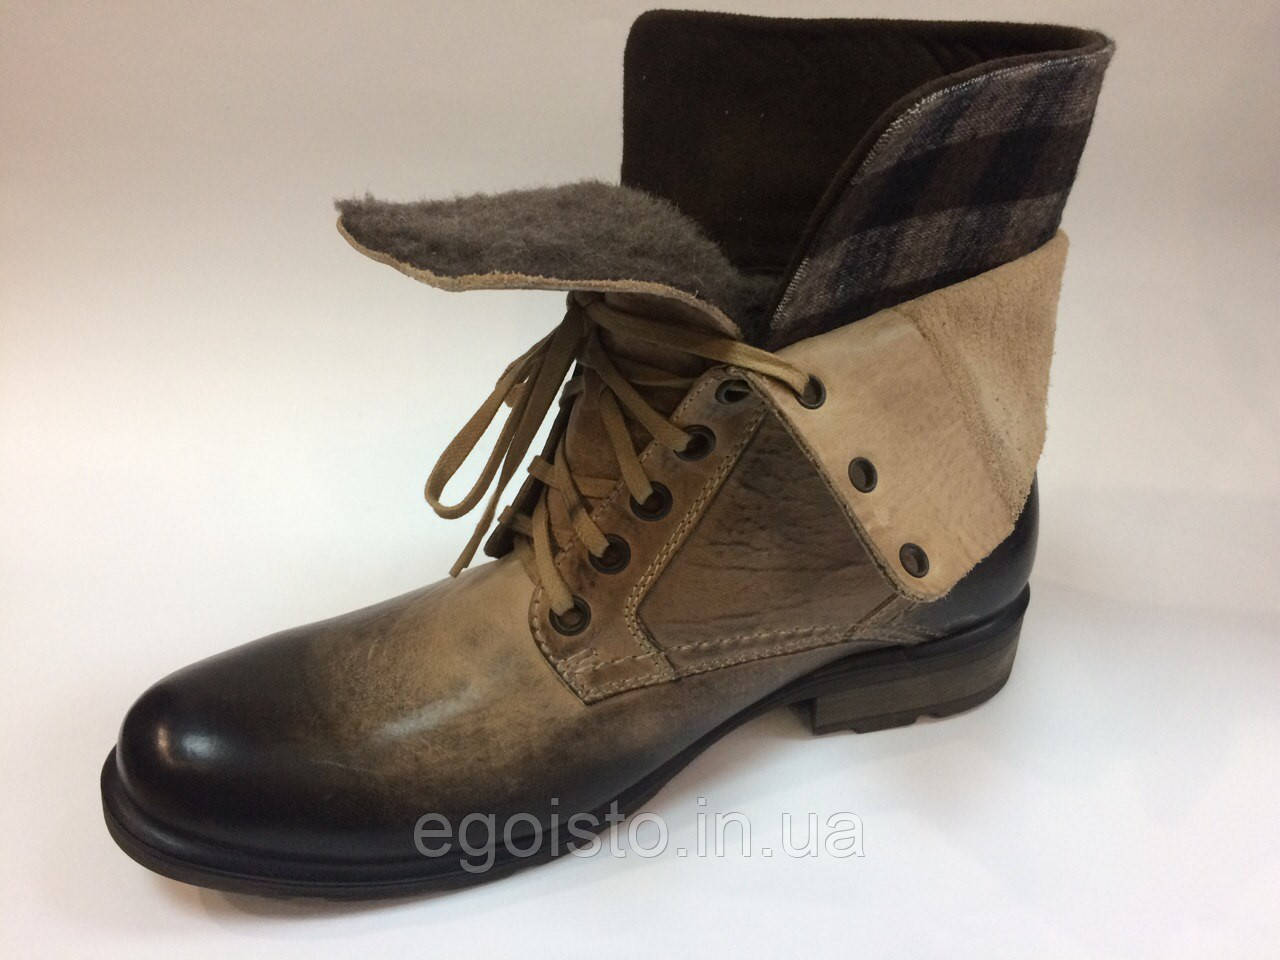 e4e98fe01 Ботинки мужские Nik Boots бежевые - Интернет-магазин брендовой обуви